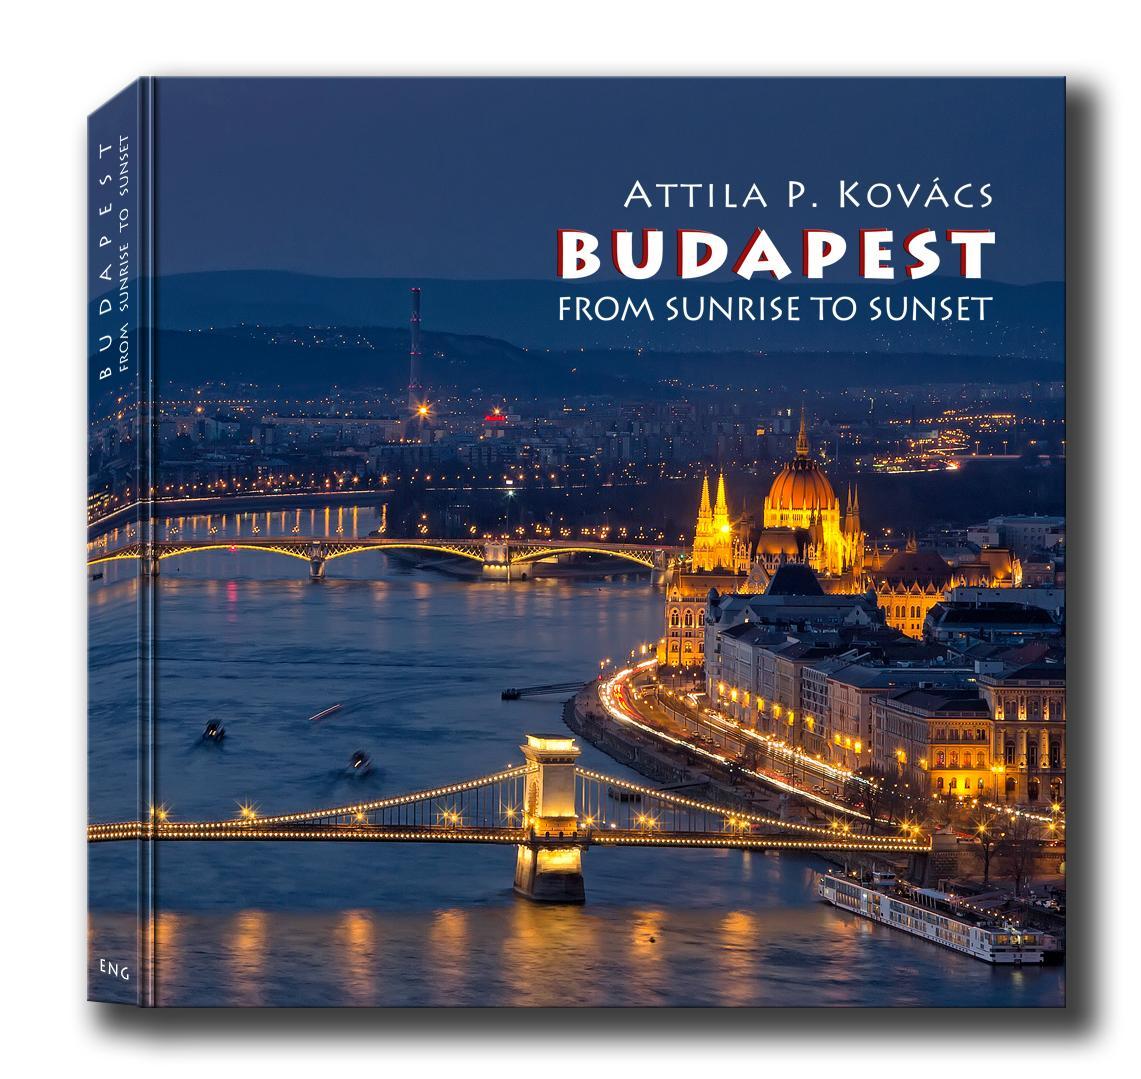 BUDAPEST FROM SUNRISE TO SUNSET (2015)